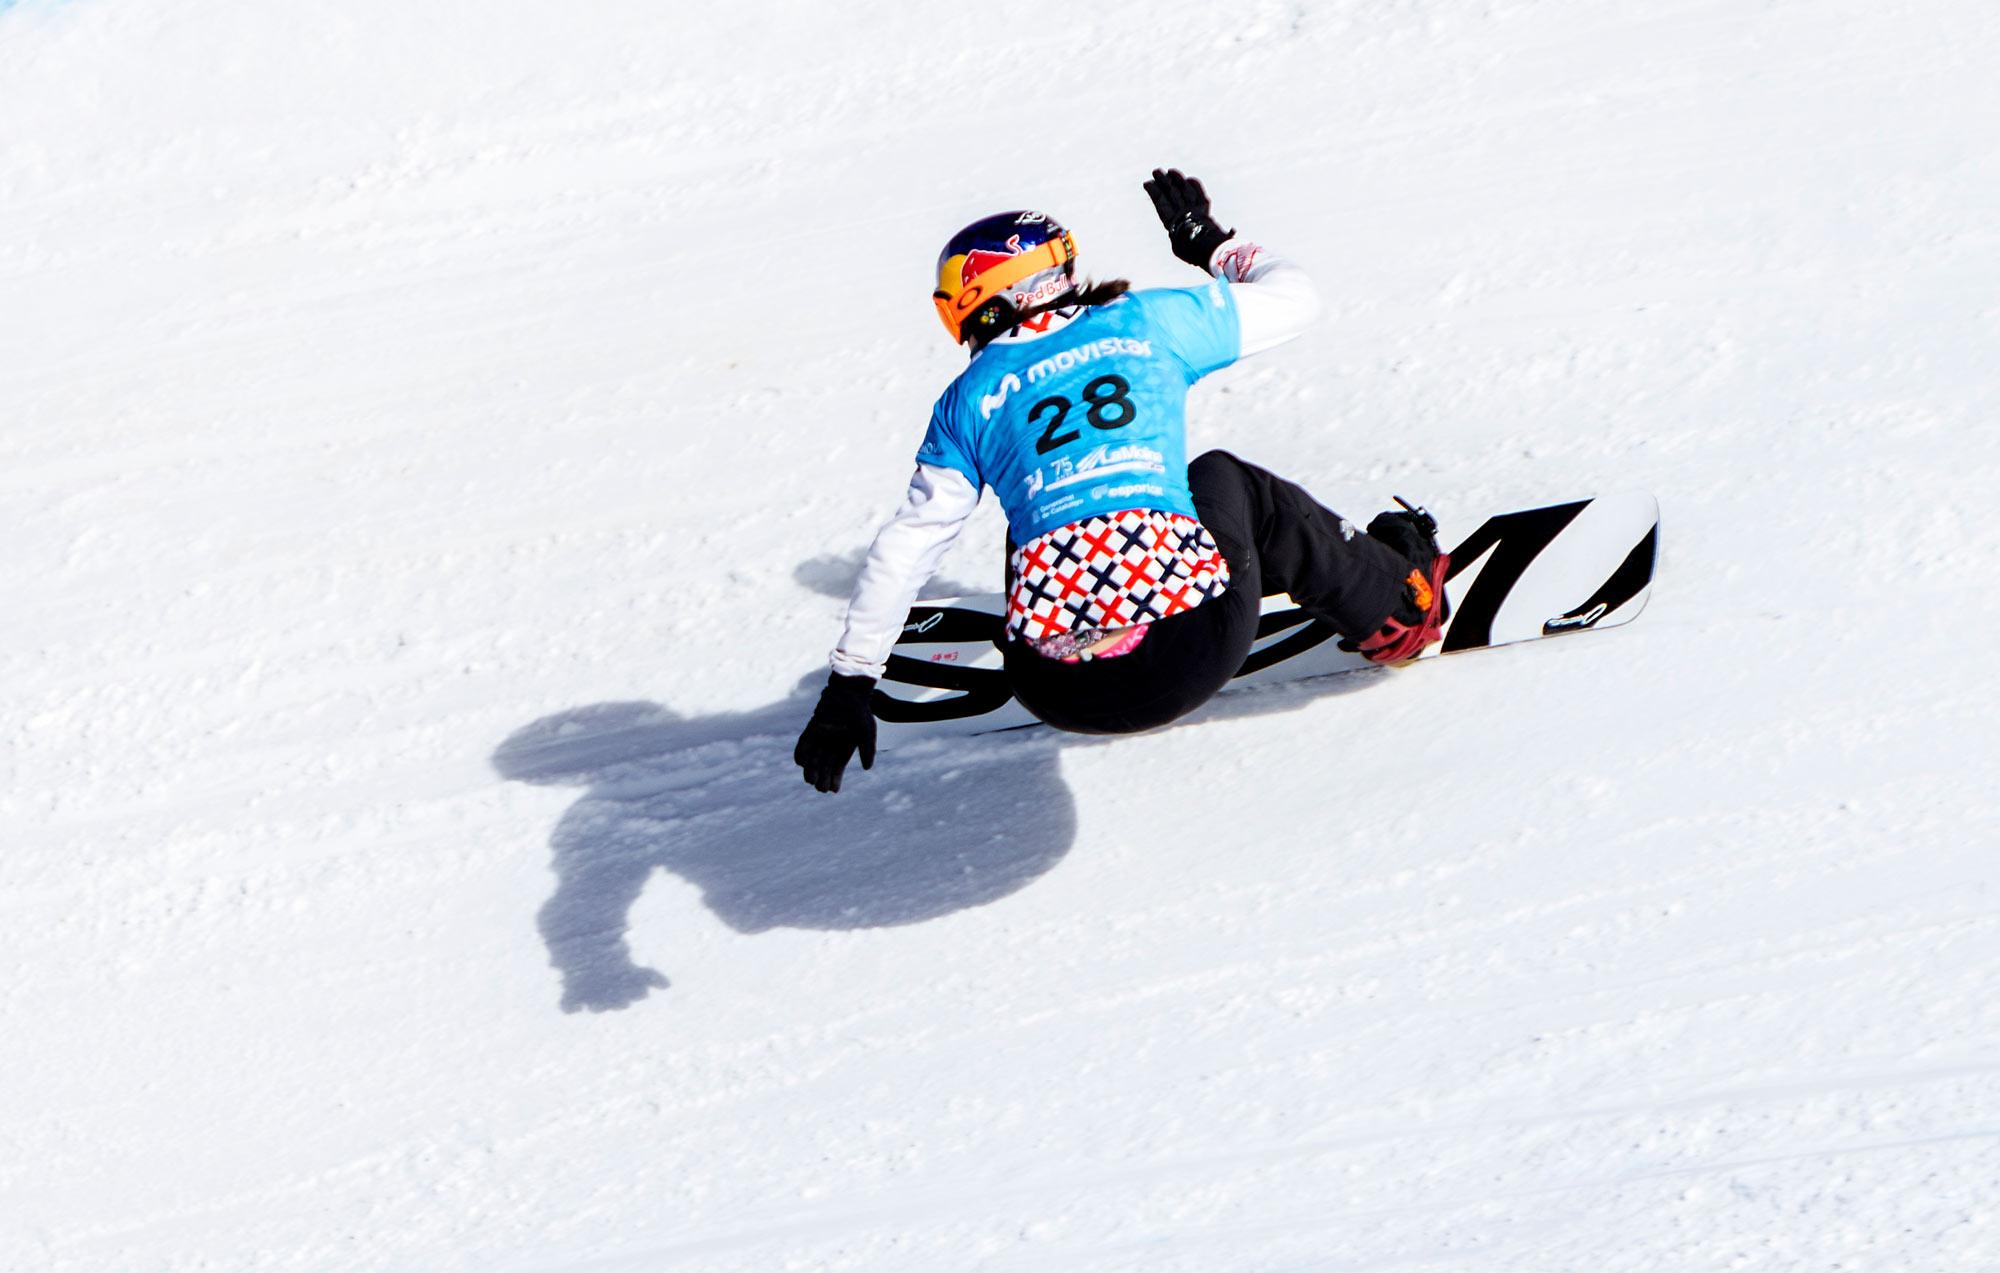 Eva Samkova (CZE) competes in Qualifiers Men SBX World Cup La Molina © Mario Sobrino #SBX #LAMOLINA #WORLDCUP #EVA #SAMKOVA #MARIOSOBRINO